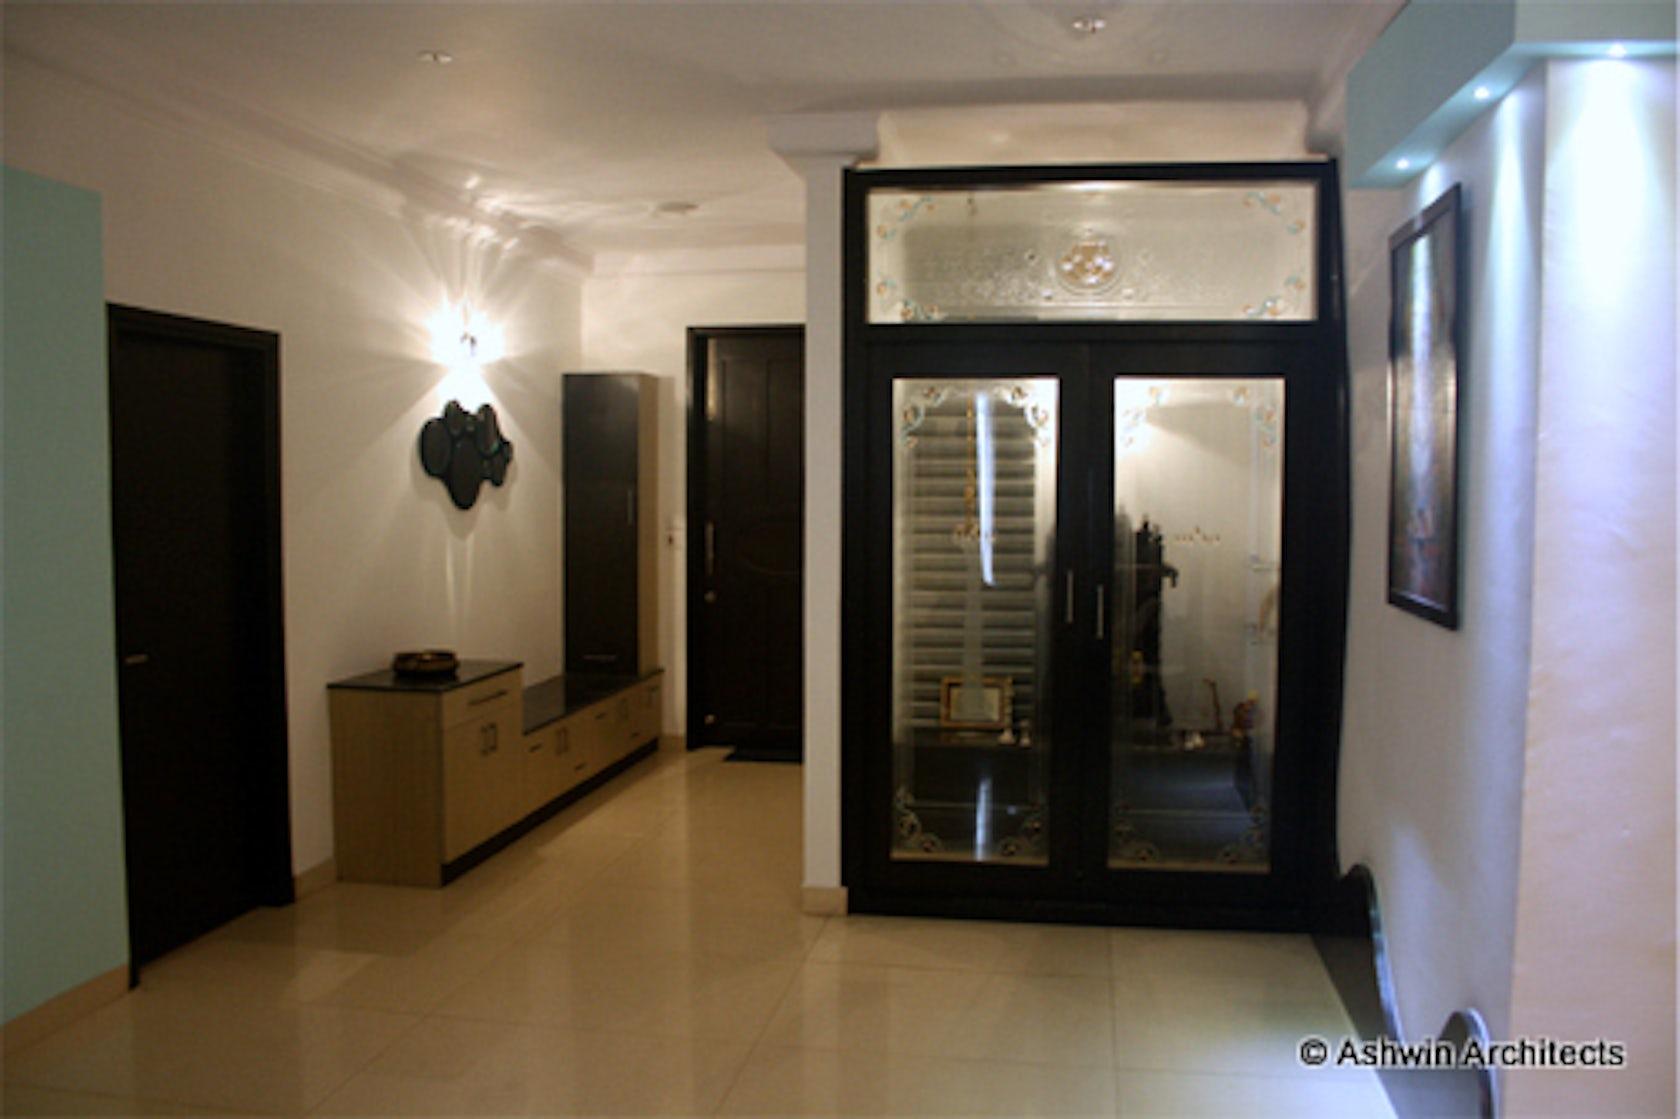 52 3 bhk interior design cost in bangalore a close for Home architecture bangalore